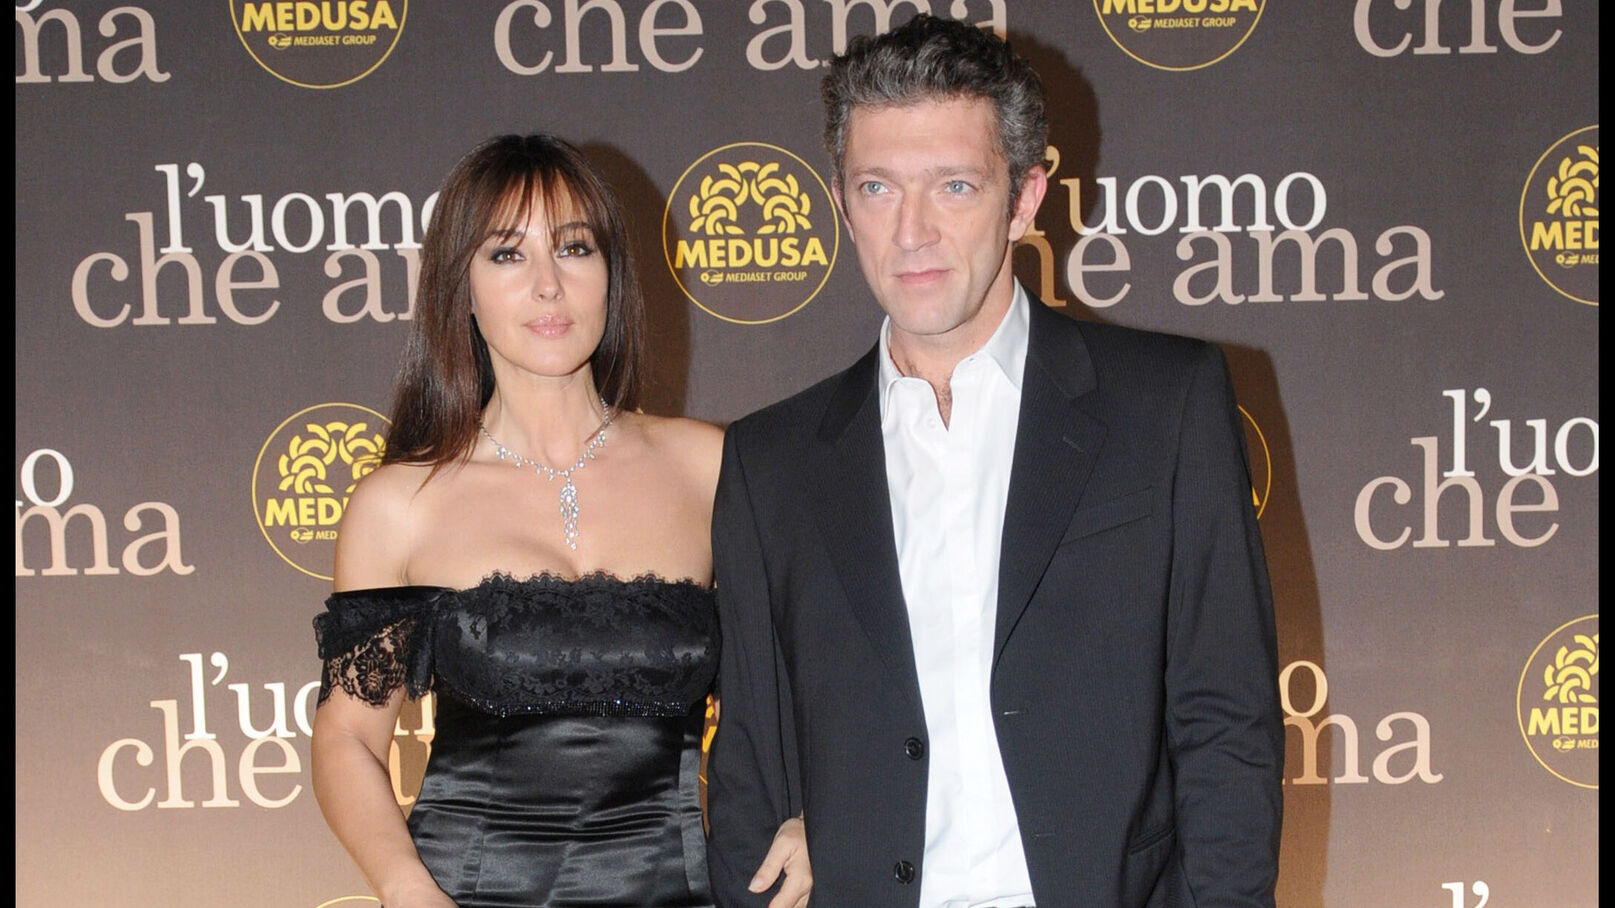 Vincent Cassel : son joli clin d'oeil à son ex-femme, Monica Bellucci